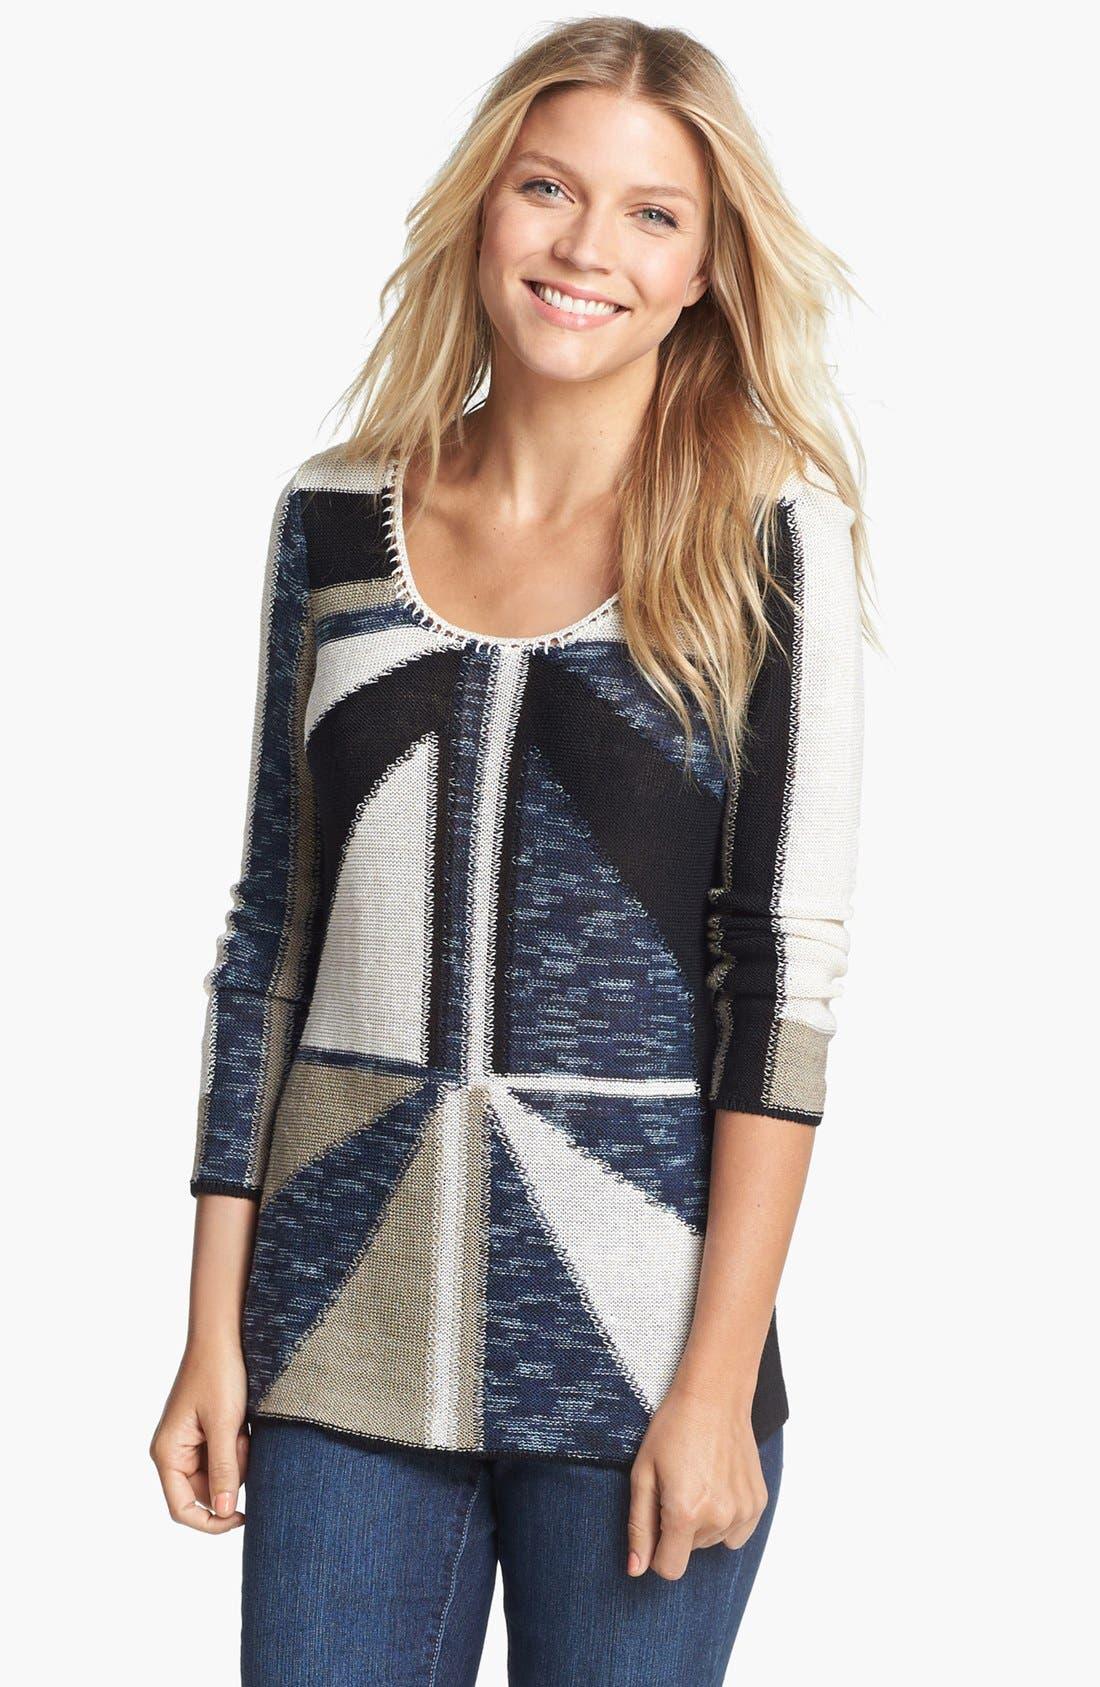 Main Image - NIC+ZOE 'Triangle' Sweater